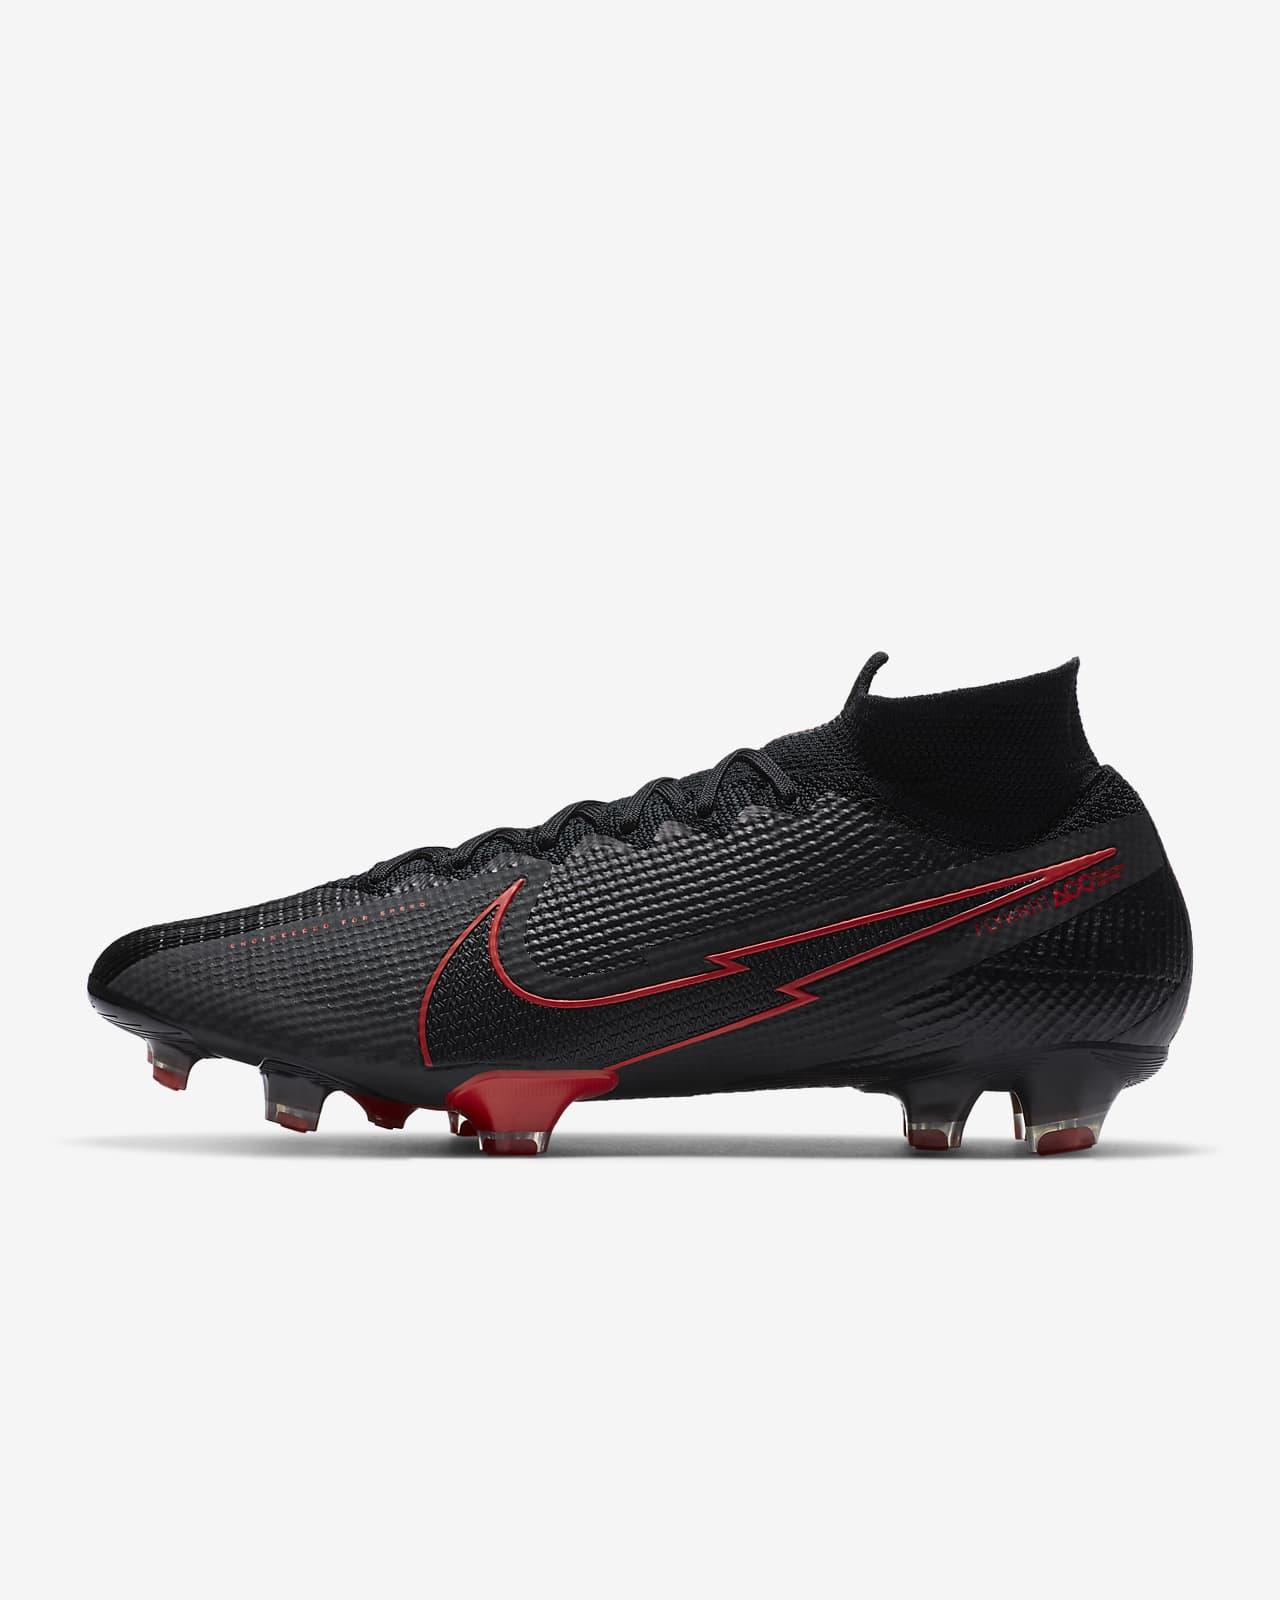 Calzado de fútbol para terreno firme Nike Mercurial Superfly 7 Elite FG